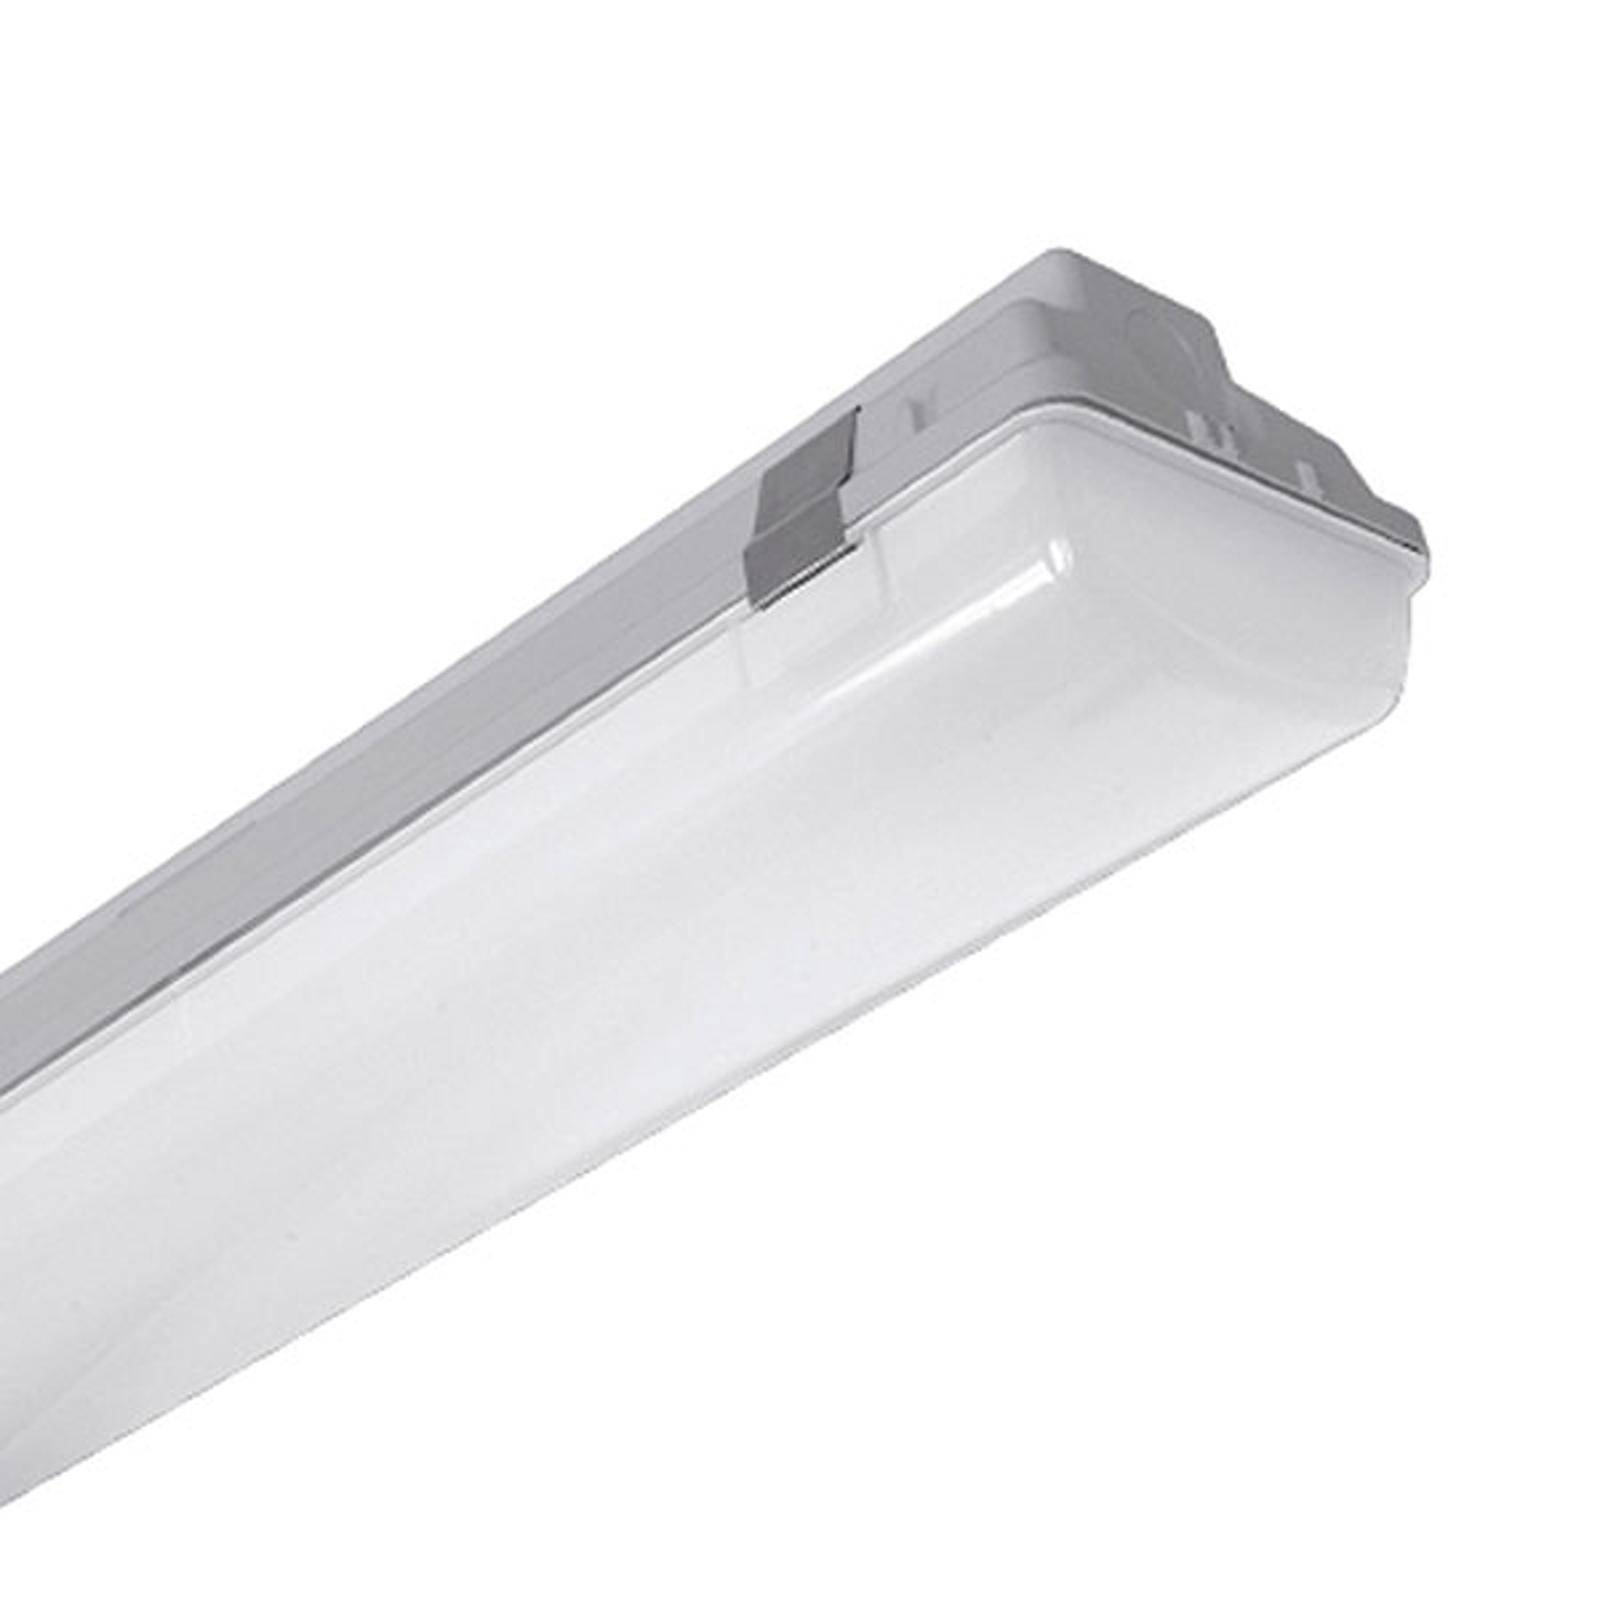 Acro XS Fortiled loftlampe til vådrum 66,5 W